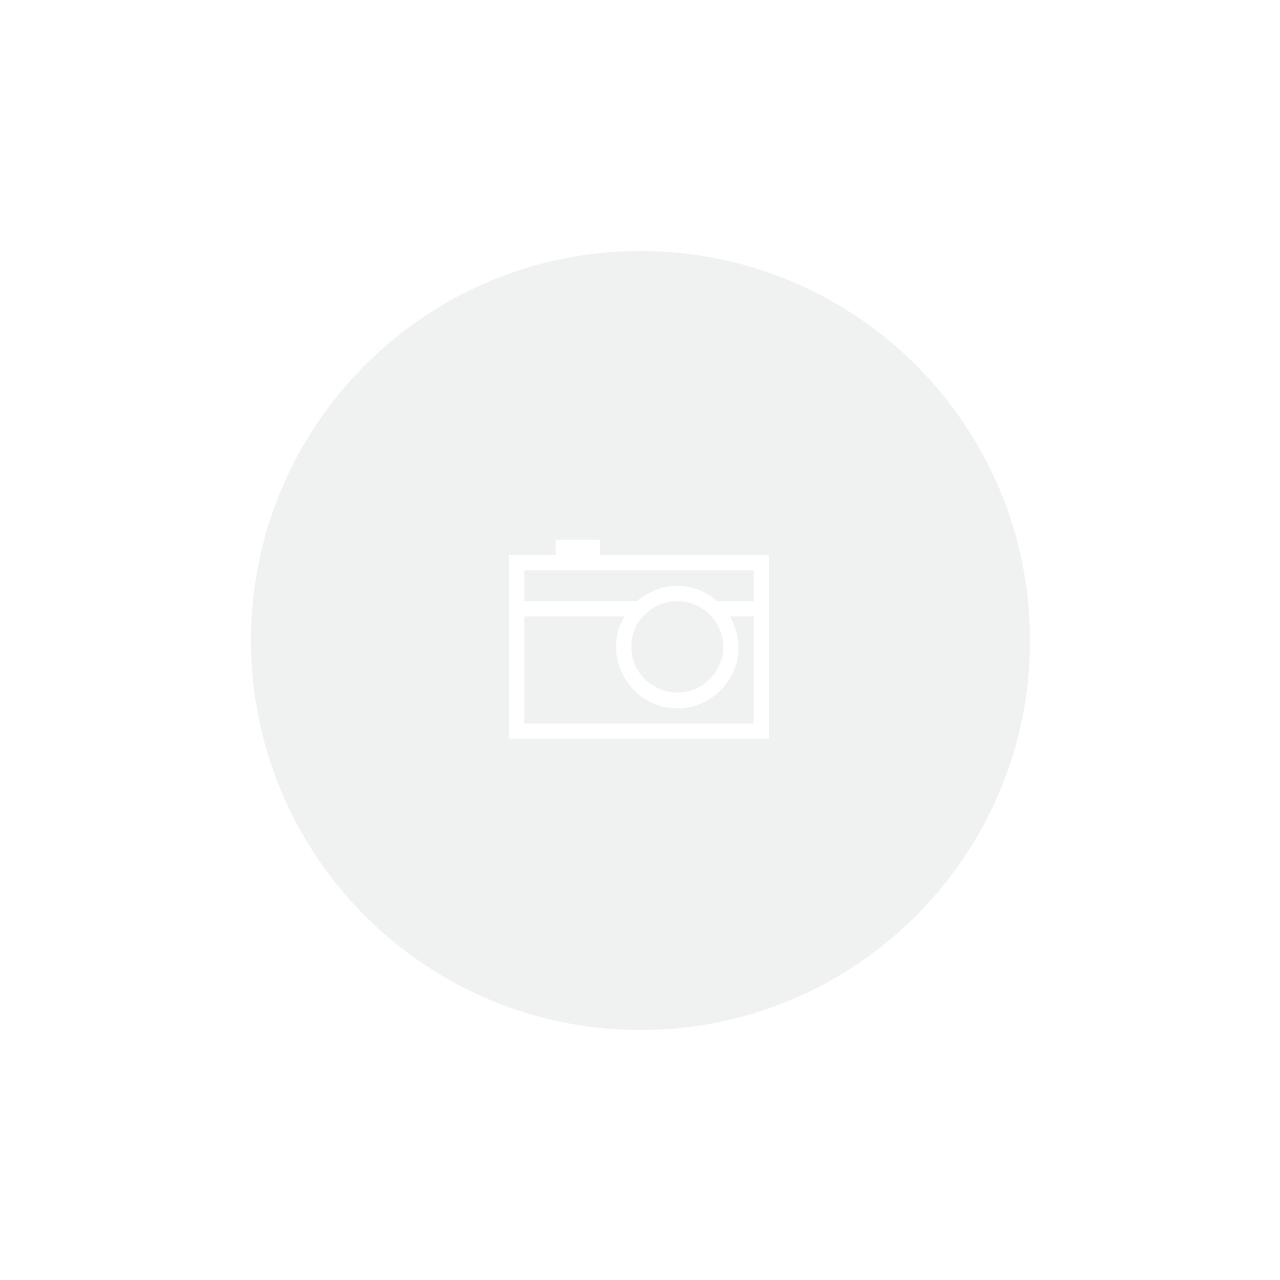 Papel Artesanal Indiano - Ref. 69